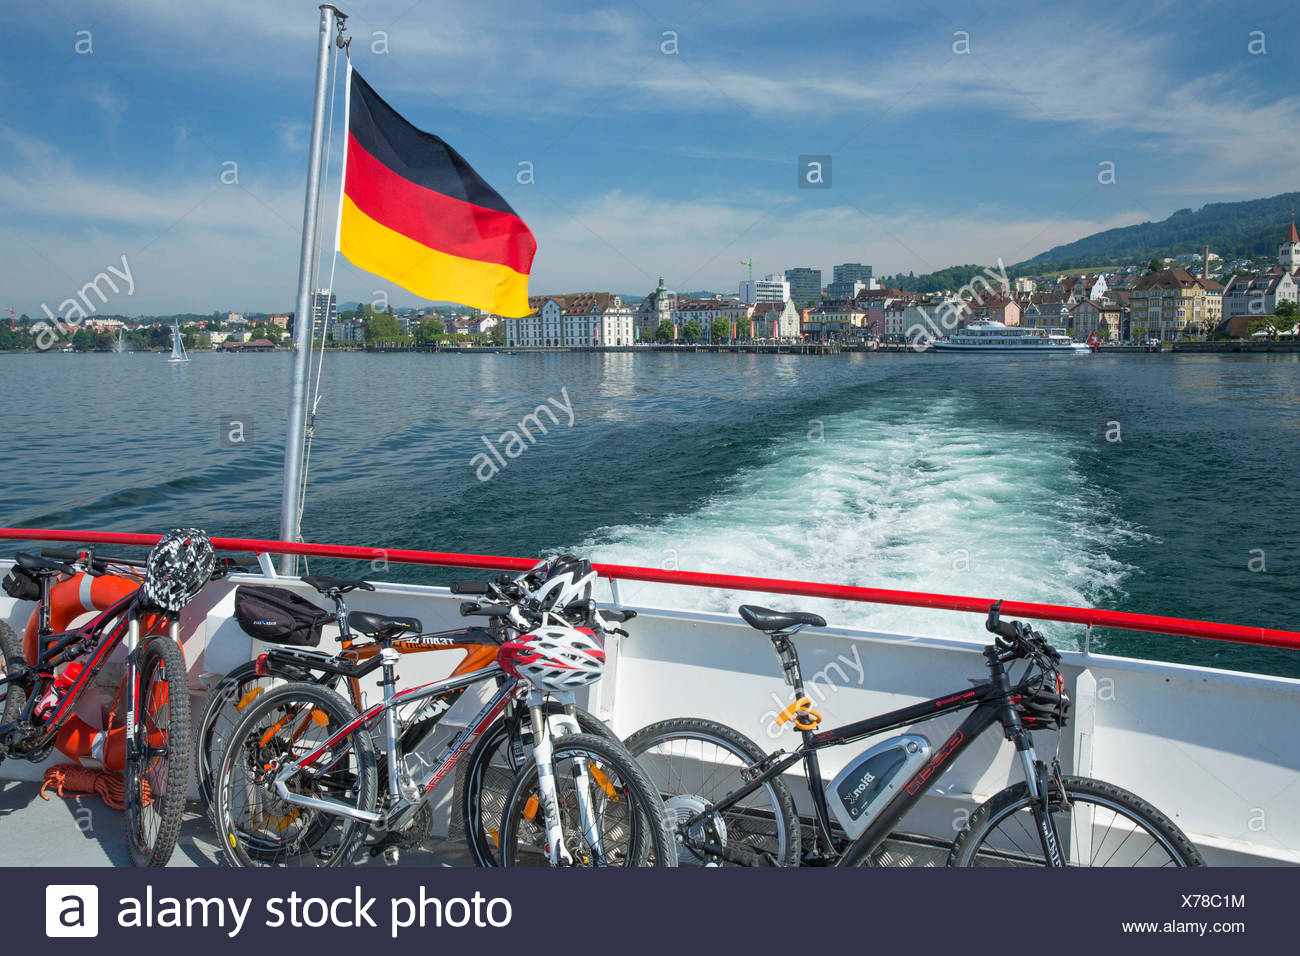 Lake Constance, ship journey, ship, boat, ships, boats, SG, canton St. Gallen, lake, lakes, bicycle, bicycles, bike, riding a bi - Stock Image